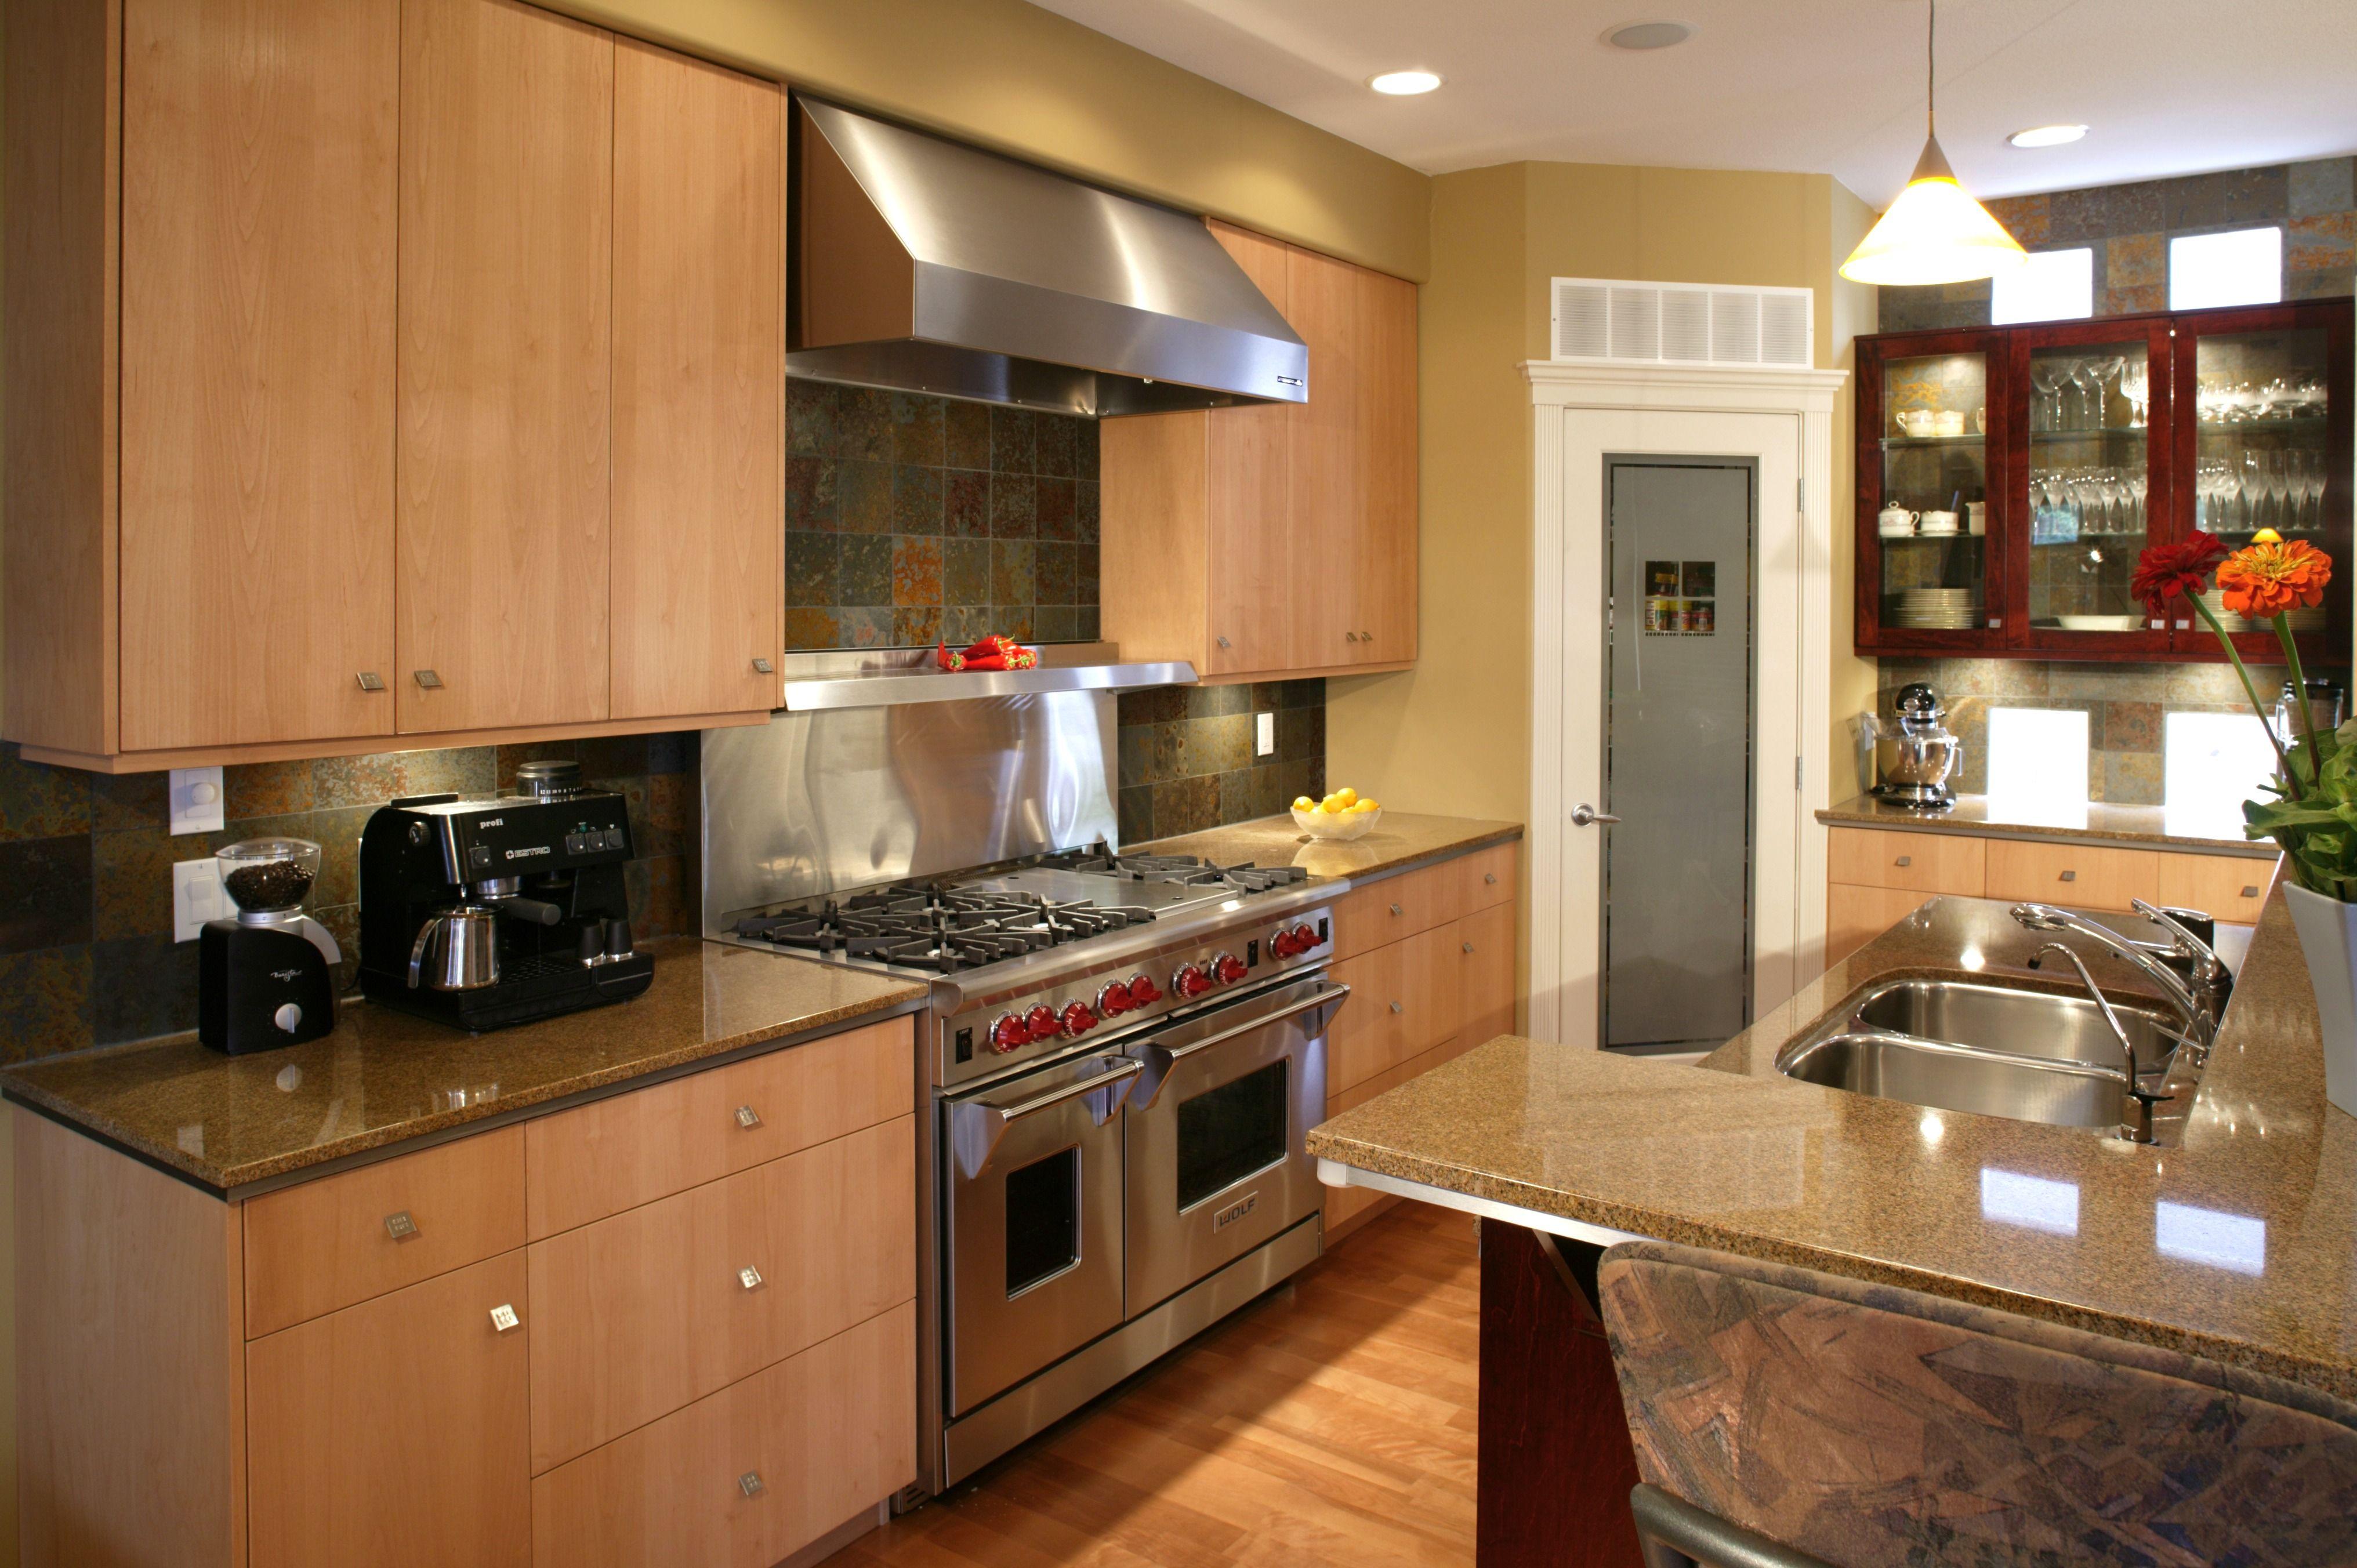 Best Way To Paint Kitchen Cabinets | Kitchen remodel ...